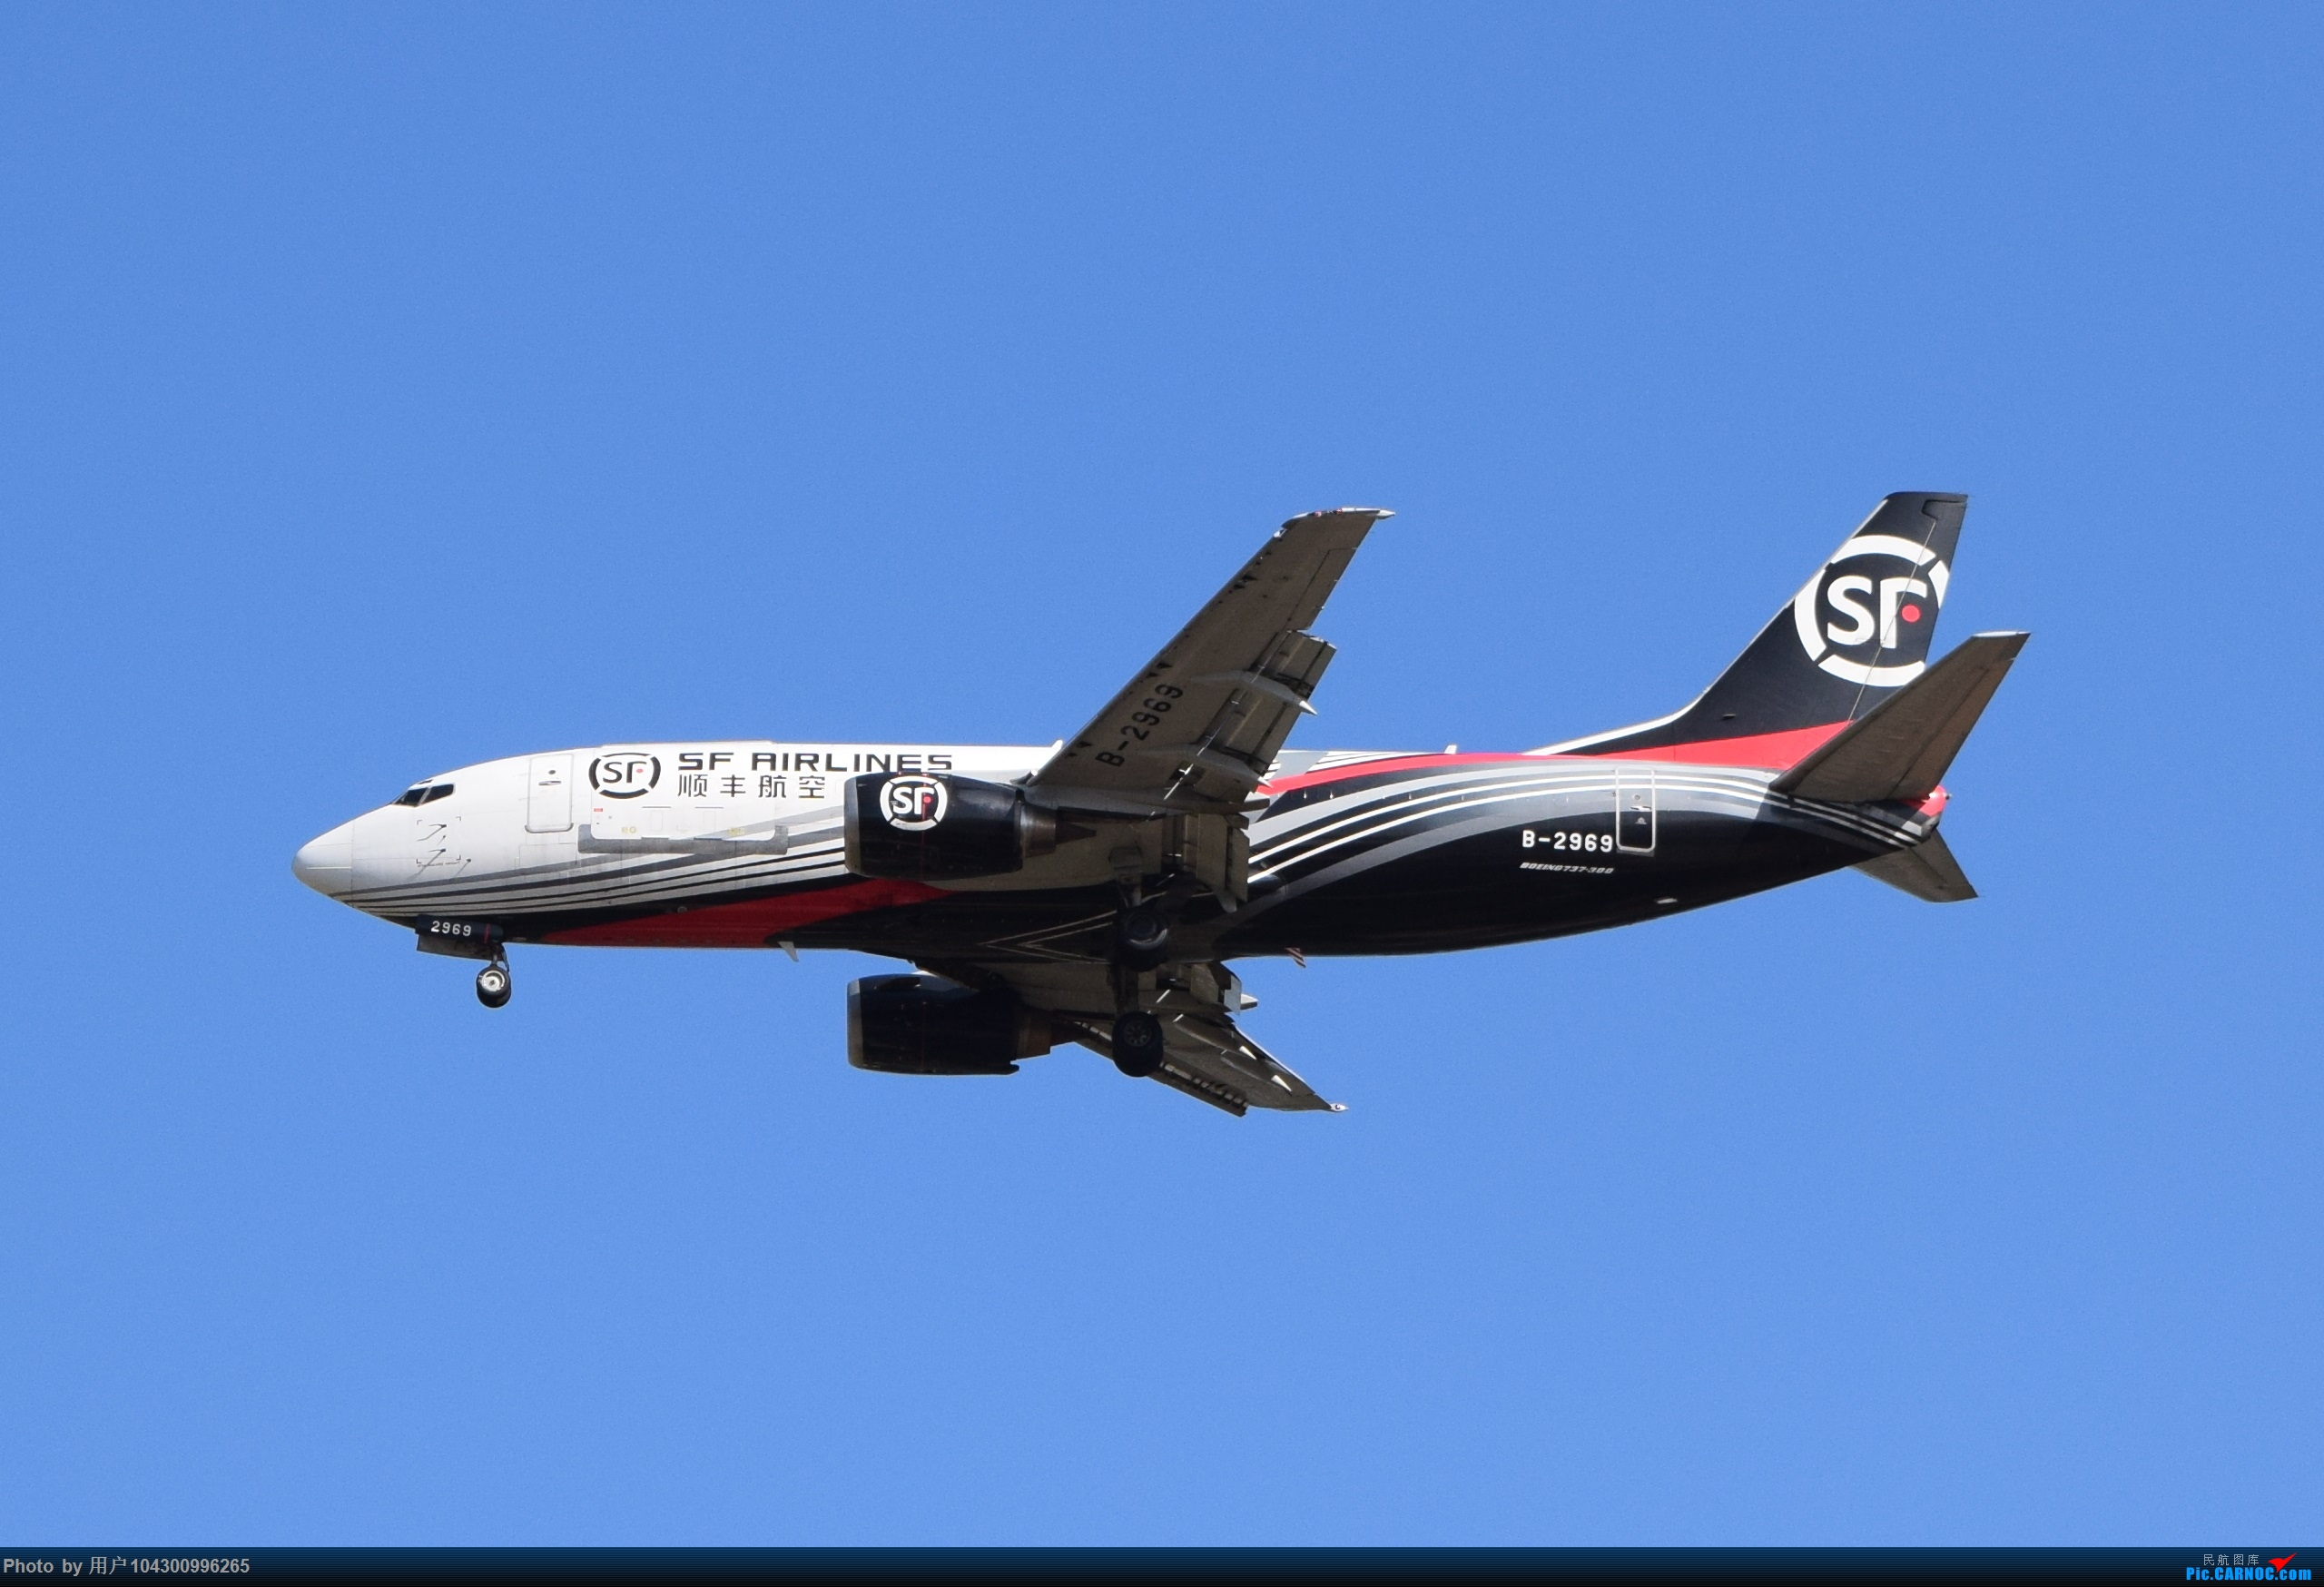 Re:[原创][KWE]贵阳今天天气不错,随便拍几张! BOEING 737-300 B-2969 中国贵阳龙洞堡国际机场